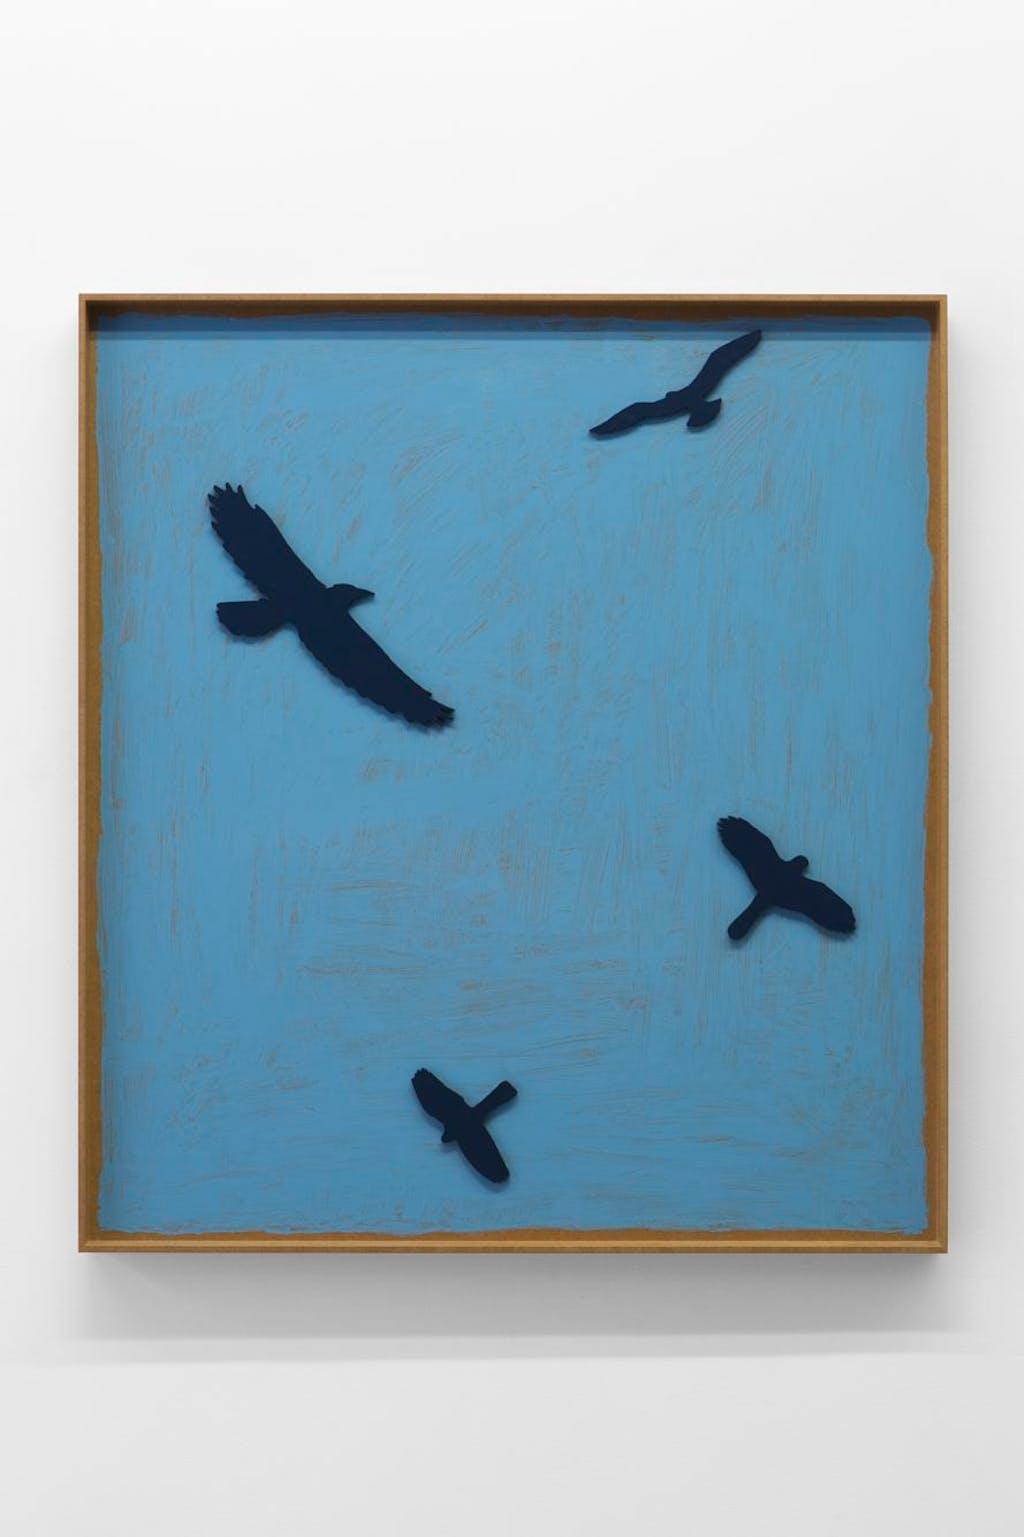 I quattro uccelli - © kamel mennour